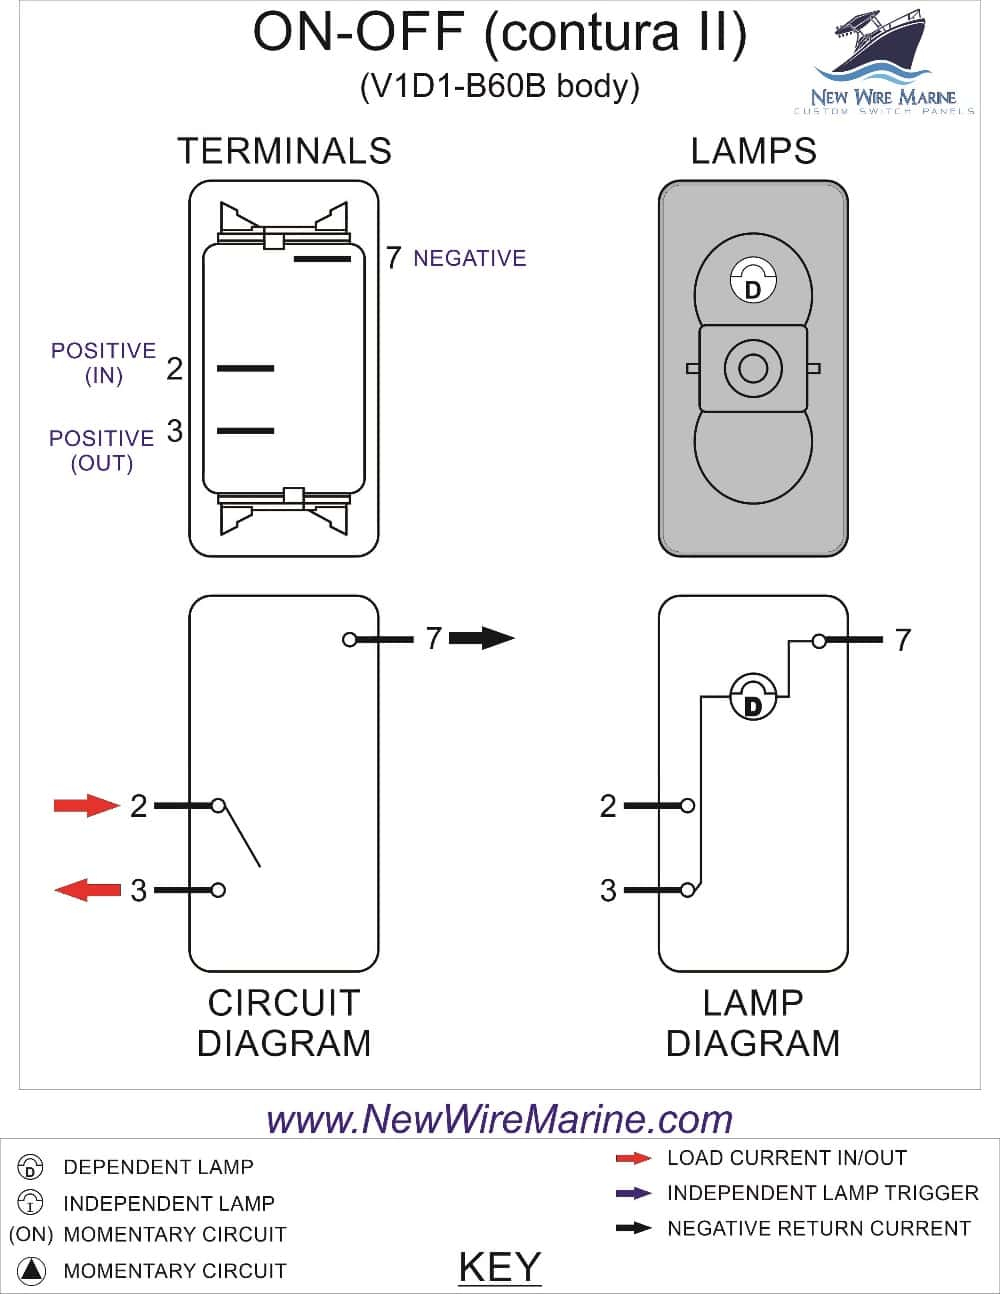 12 Volt Light Wiring Diagram 4 Pin Rocker Switch - Wiring Diagram - 4 Pin Rocker Switch Wiring Diagram